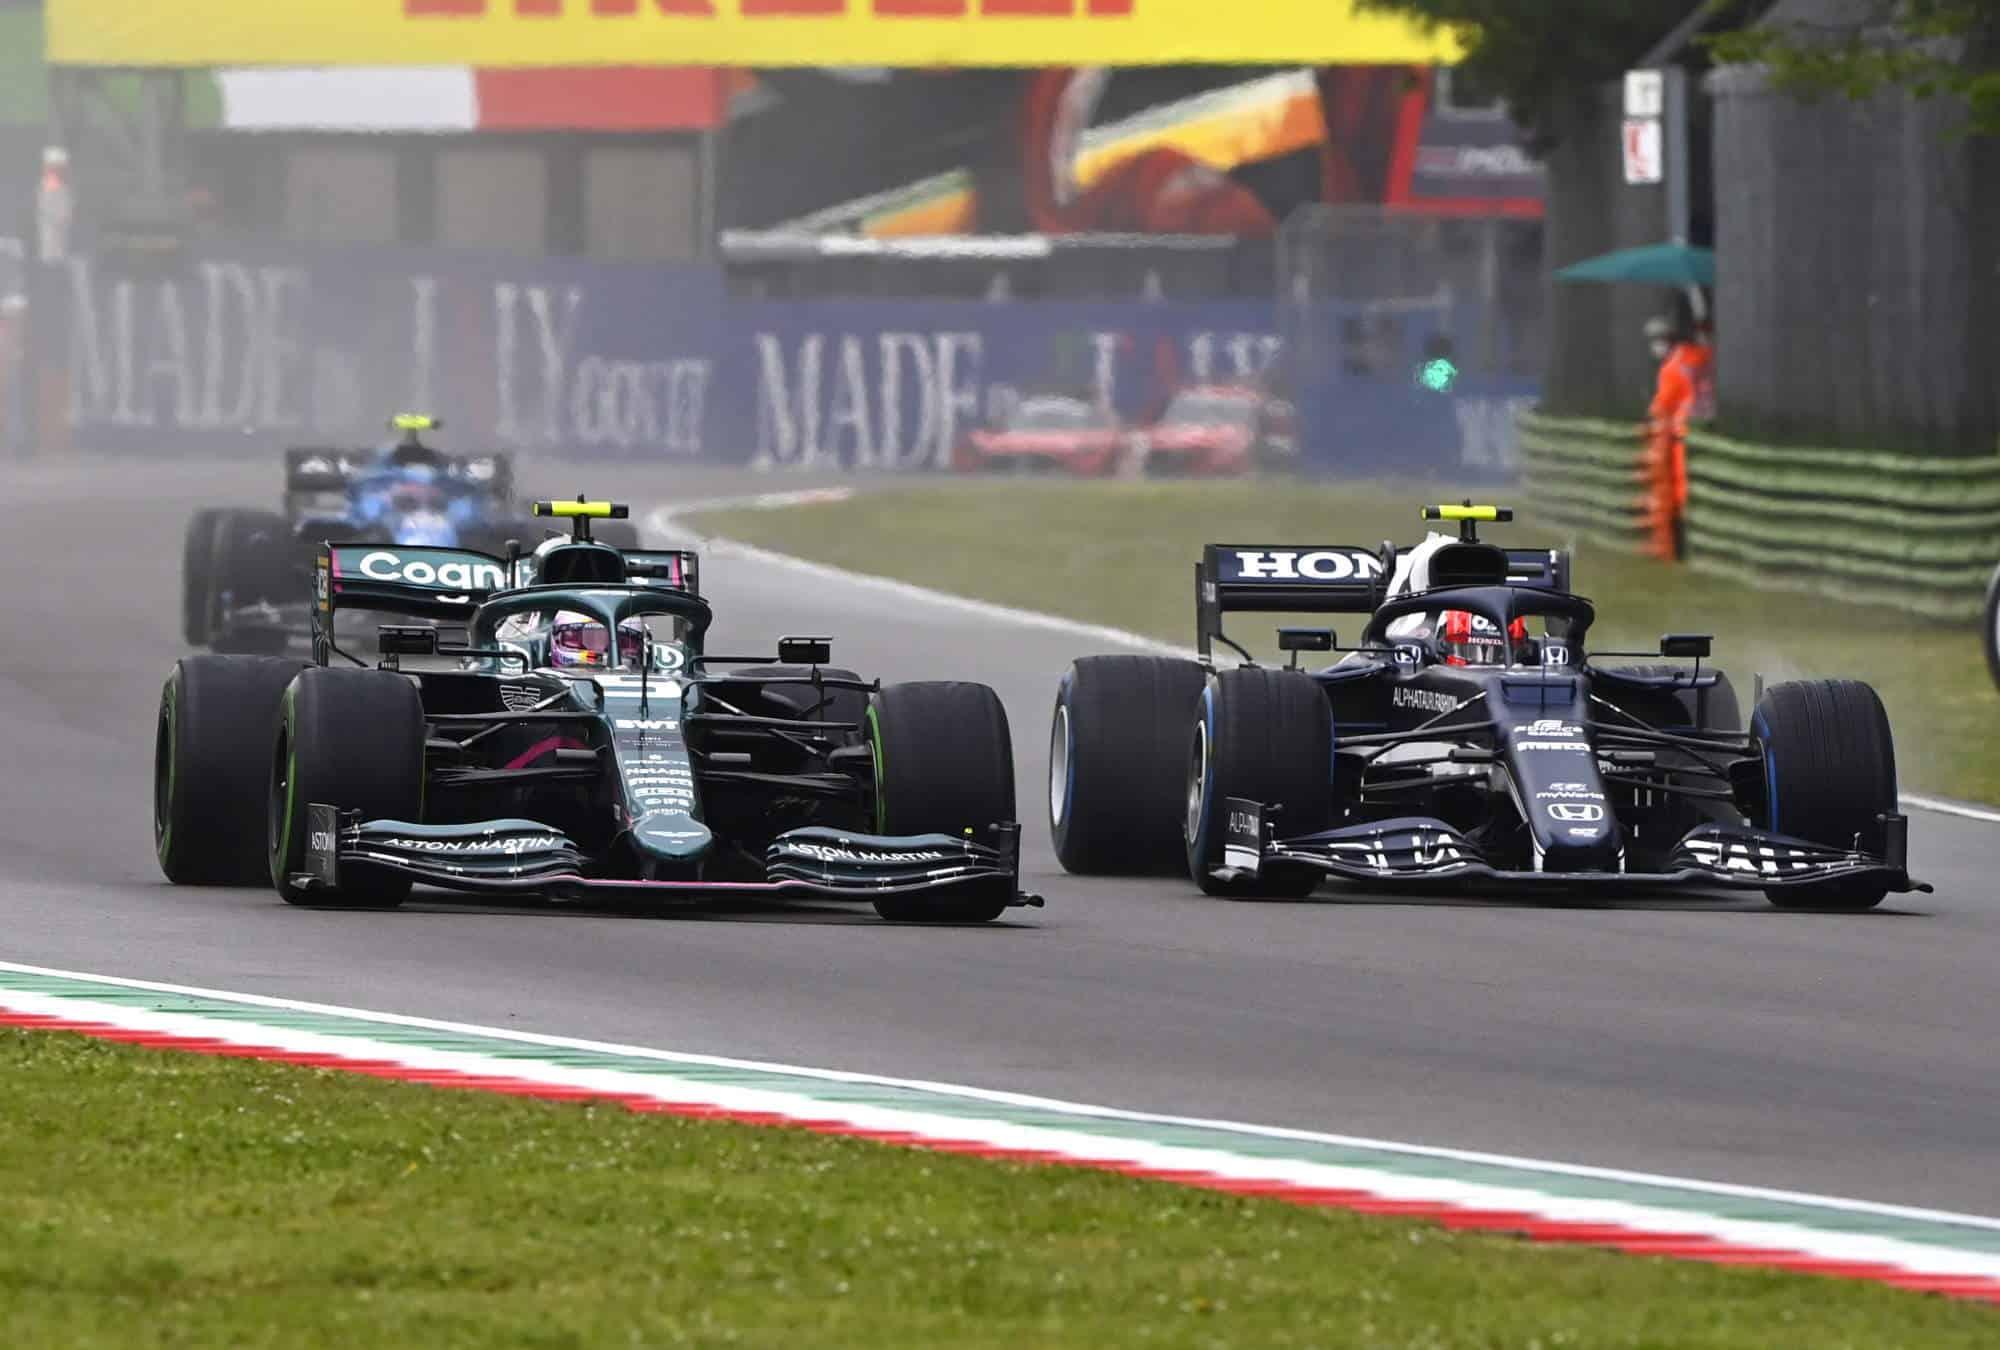 2021 Emilia Romagna GP Vettel battles Gasly in the race Photo Pirelli